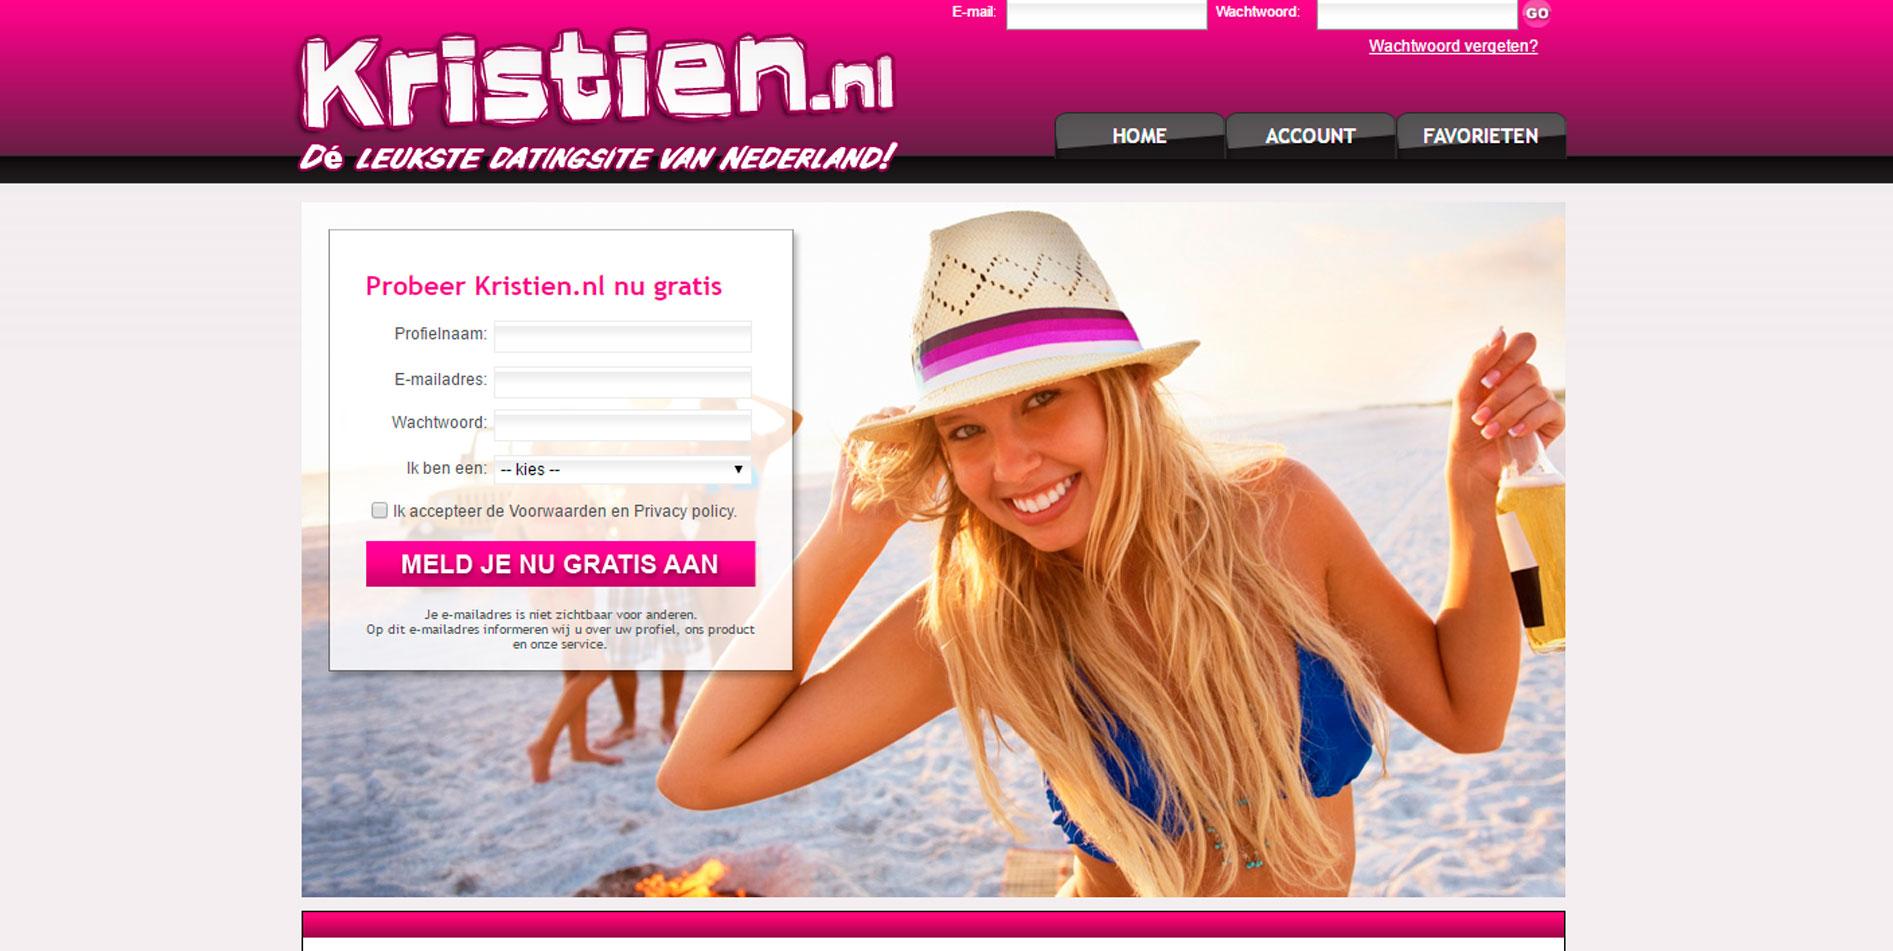 datingsite zonder credits Schiedam